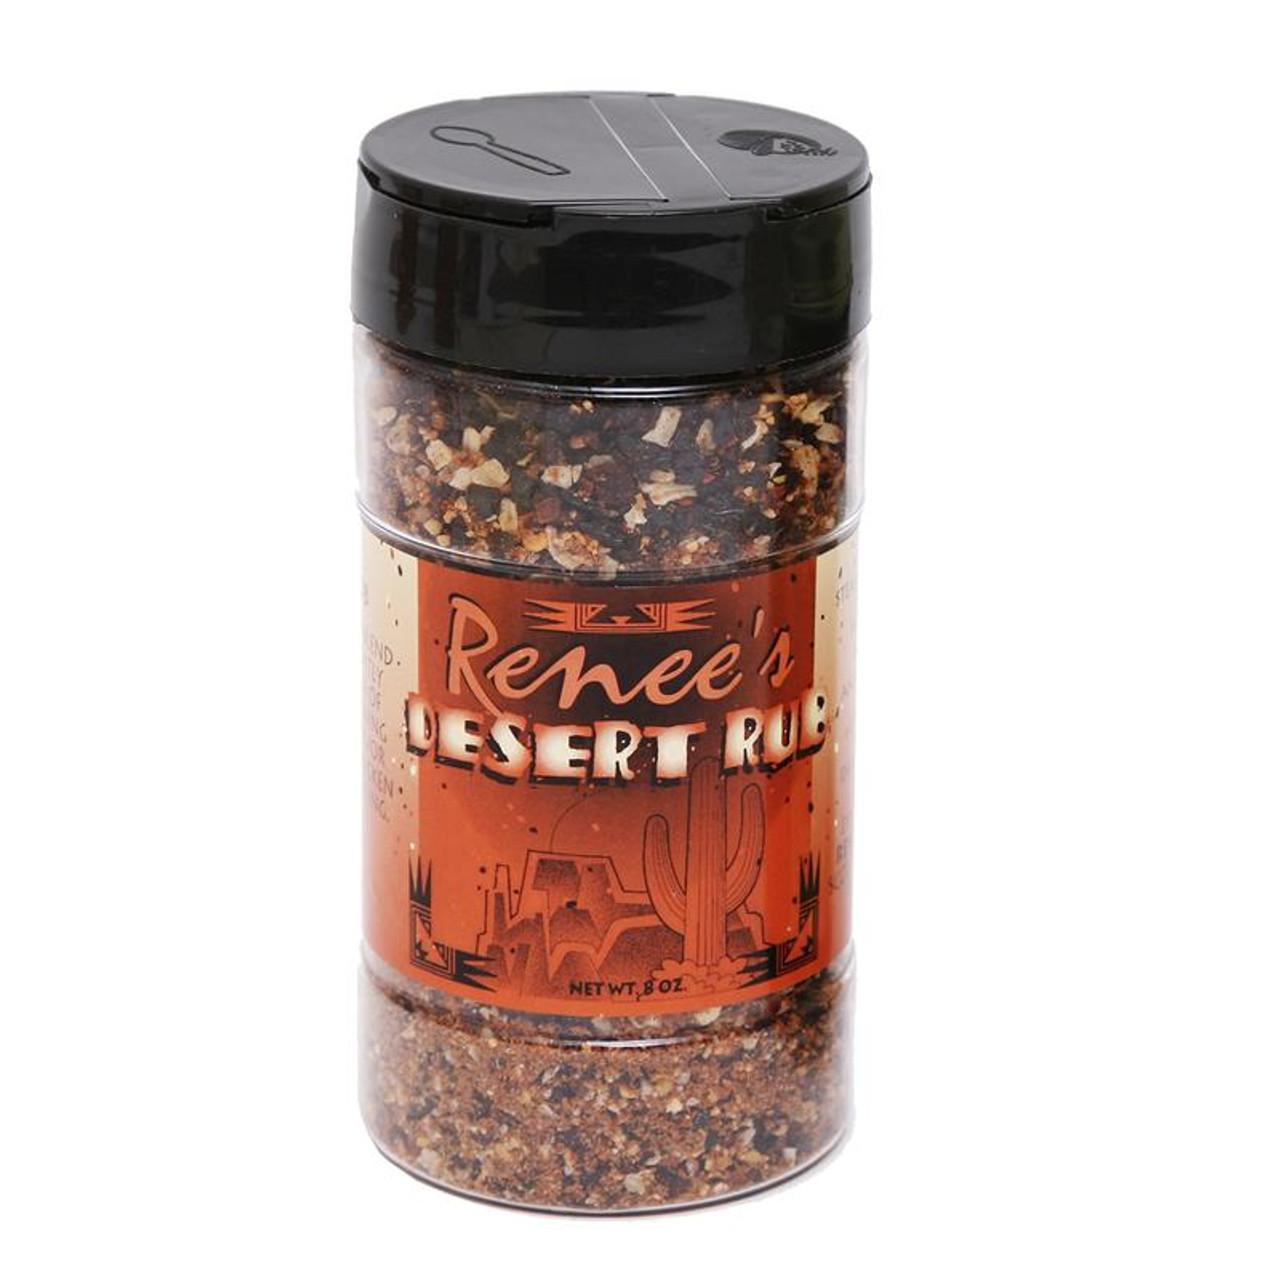 Renee's Gourmet Desert Rub 8oz